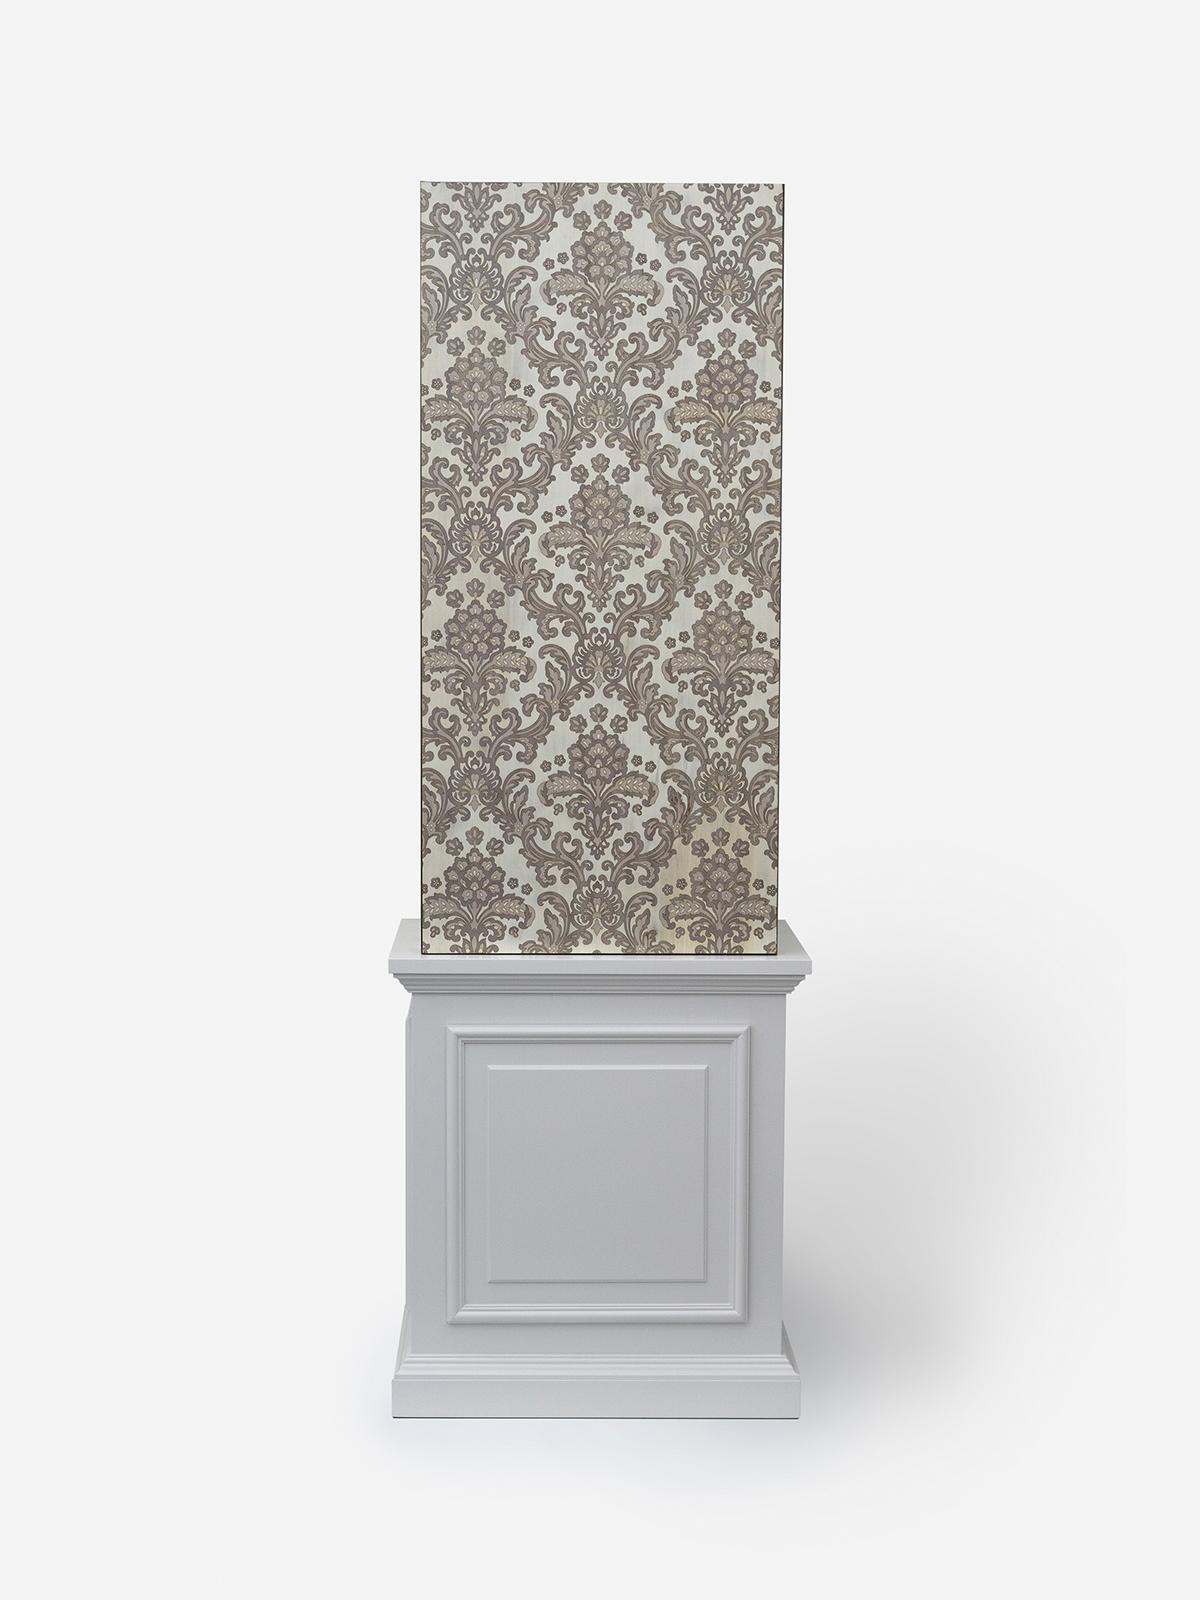 BOISERIE CABINET - Marcantonio design